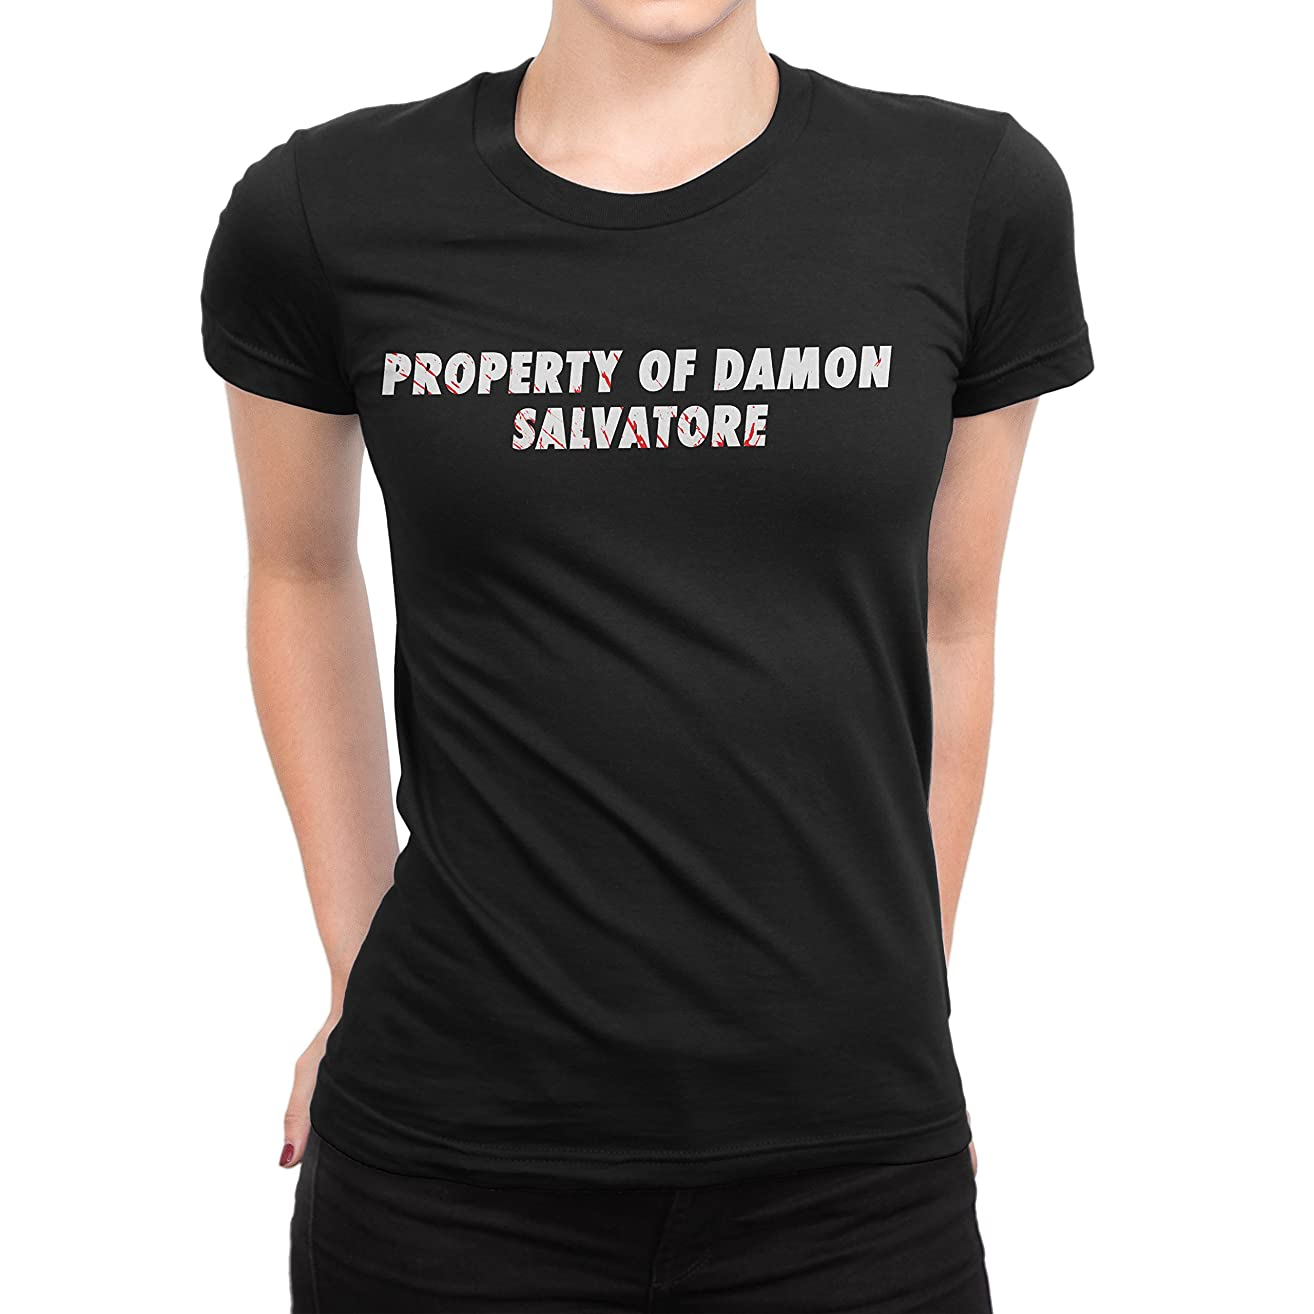 Property of Damon Salvatore T-Shirt